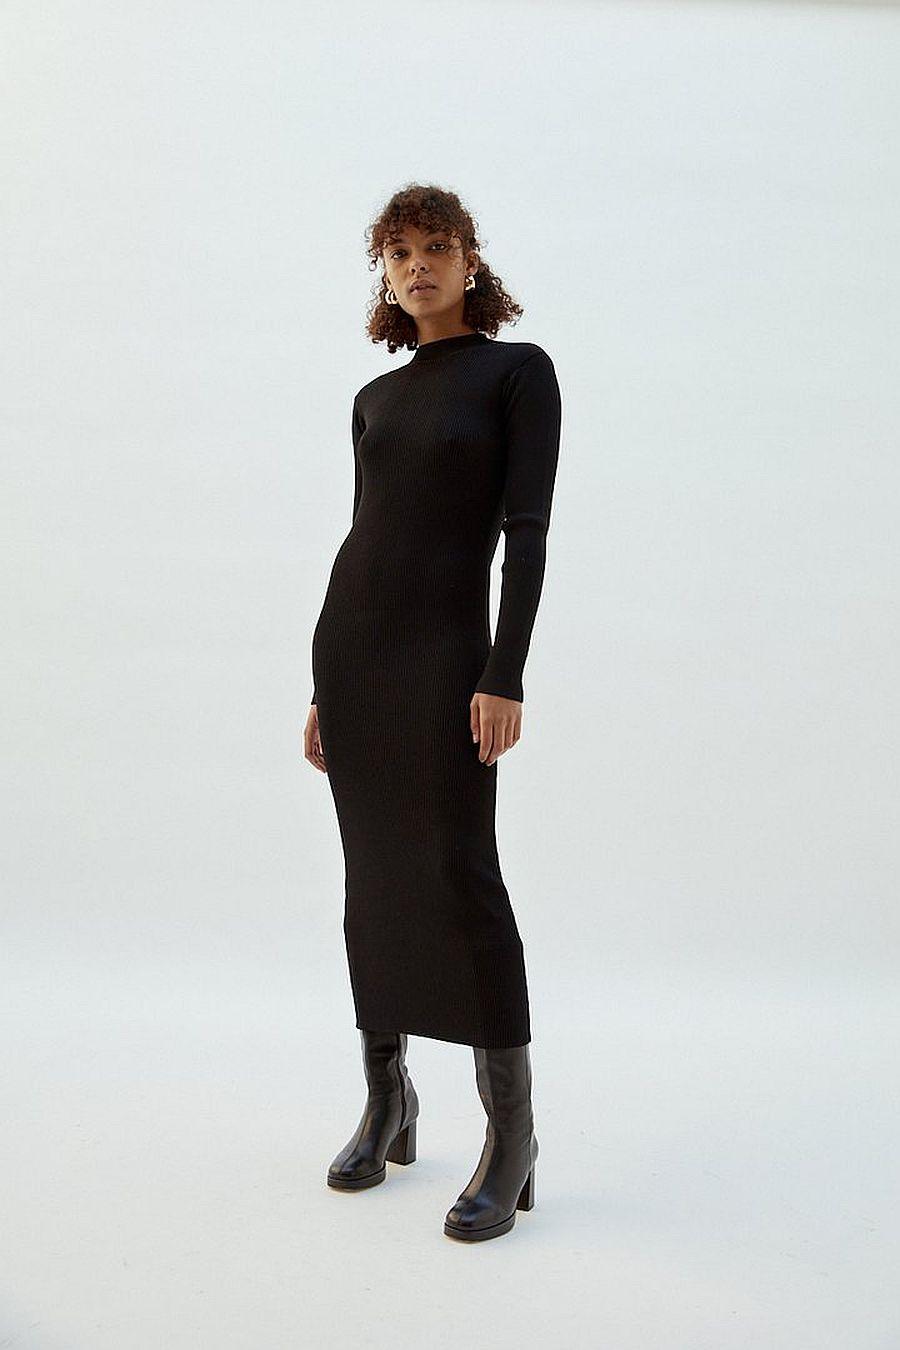 MUSIER Paris Darc Dress